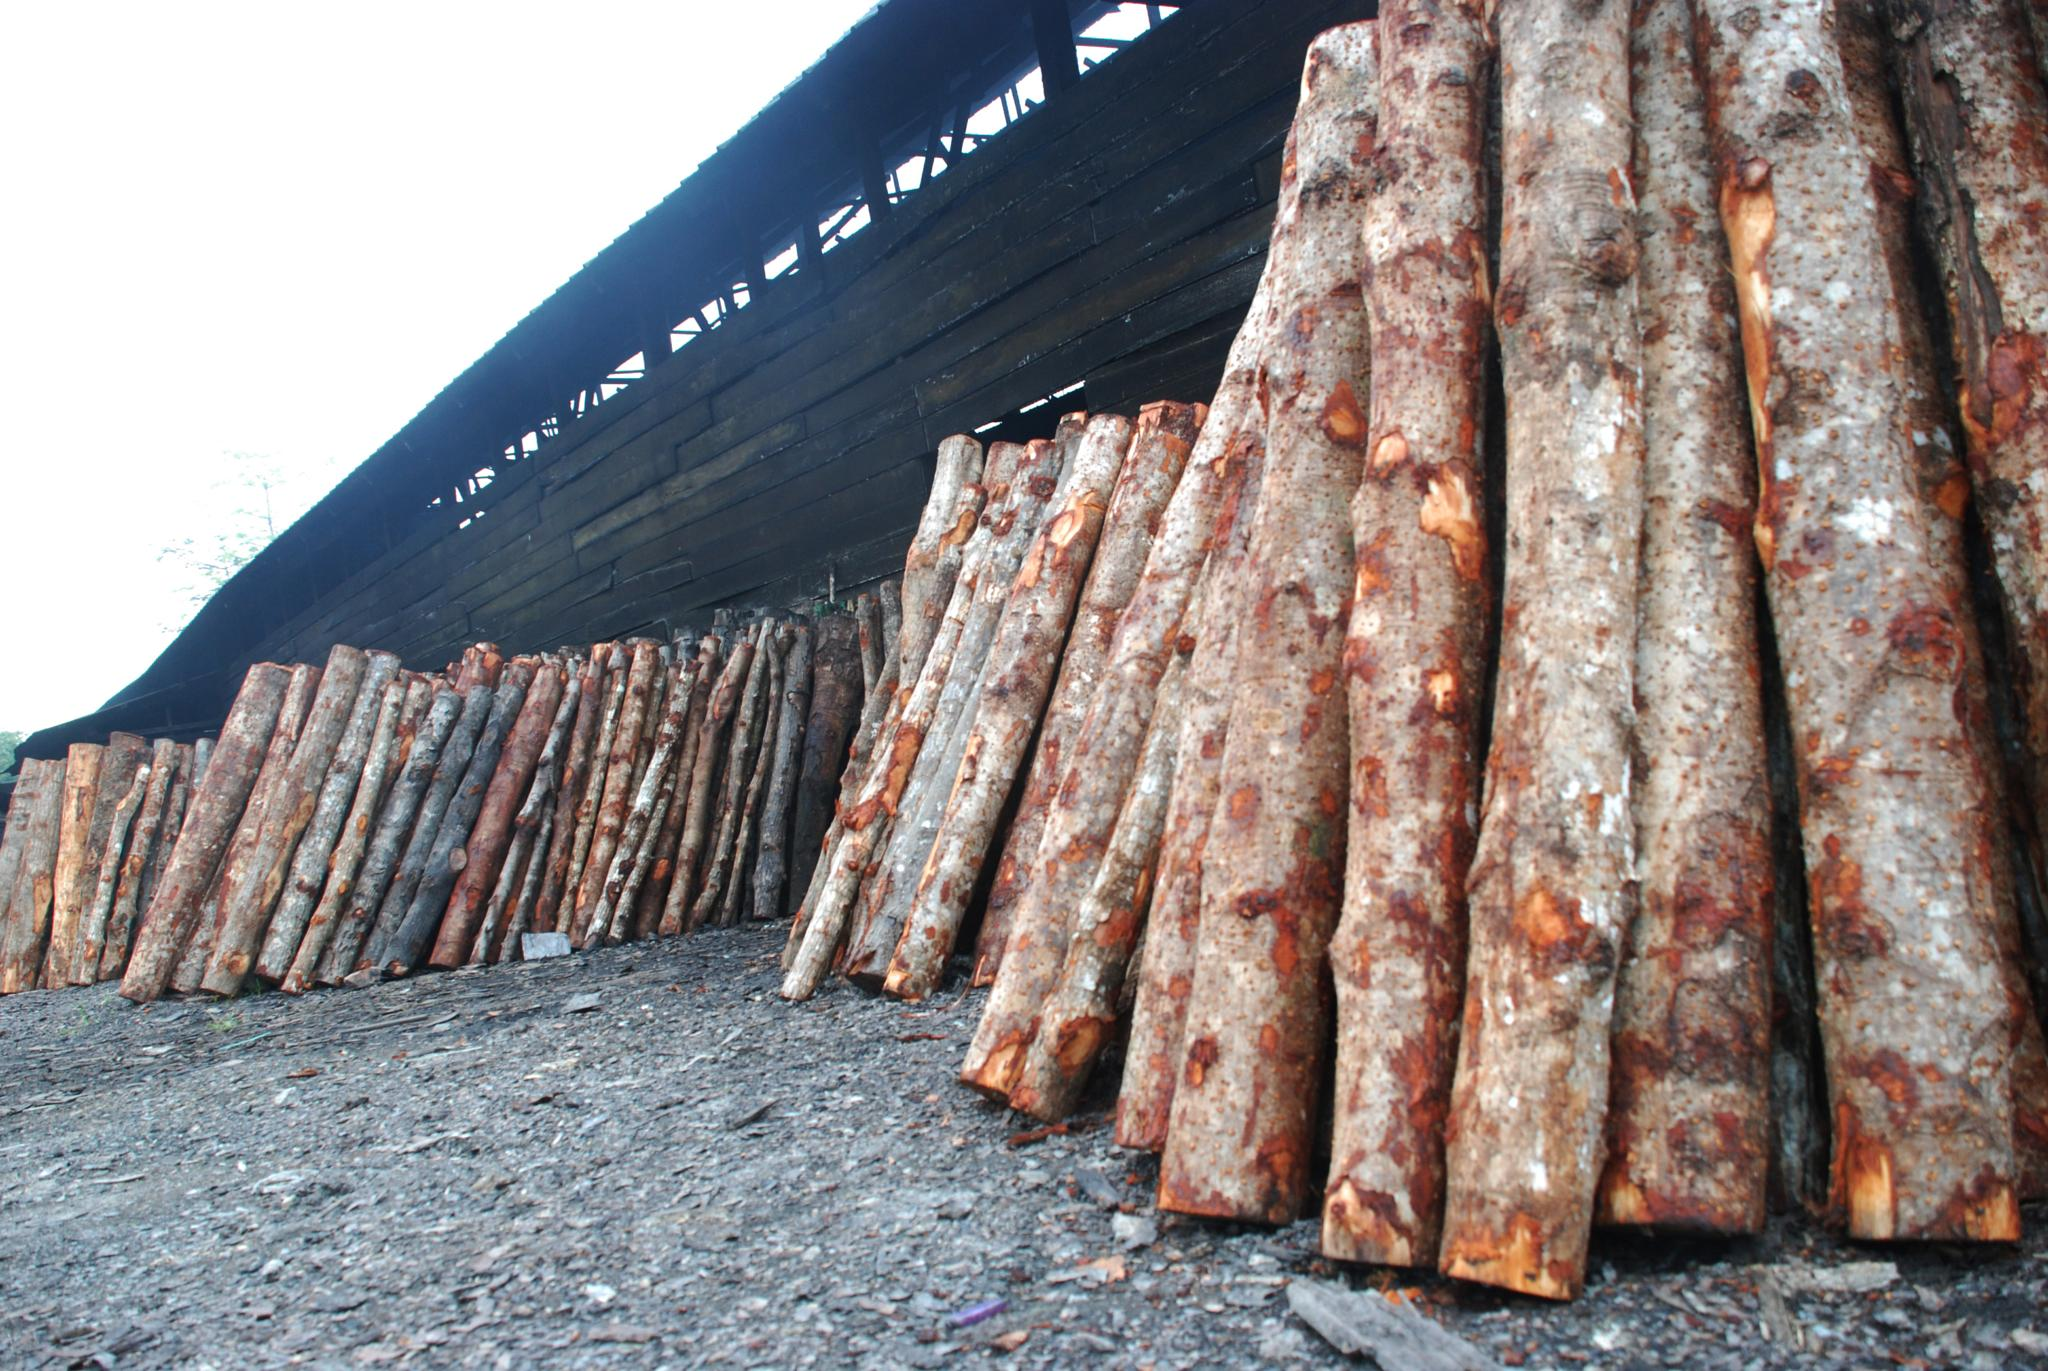 kuala sepetang taiping charcoal factory by wooyuenfoo